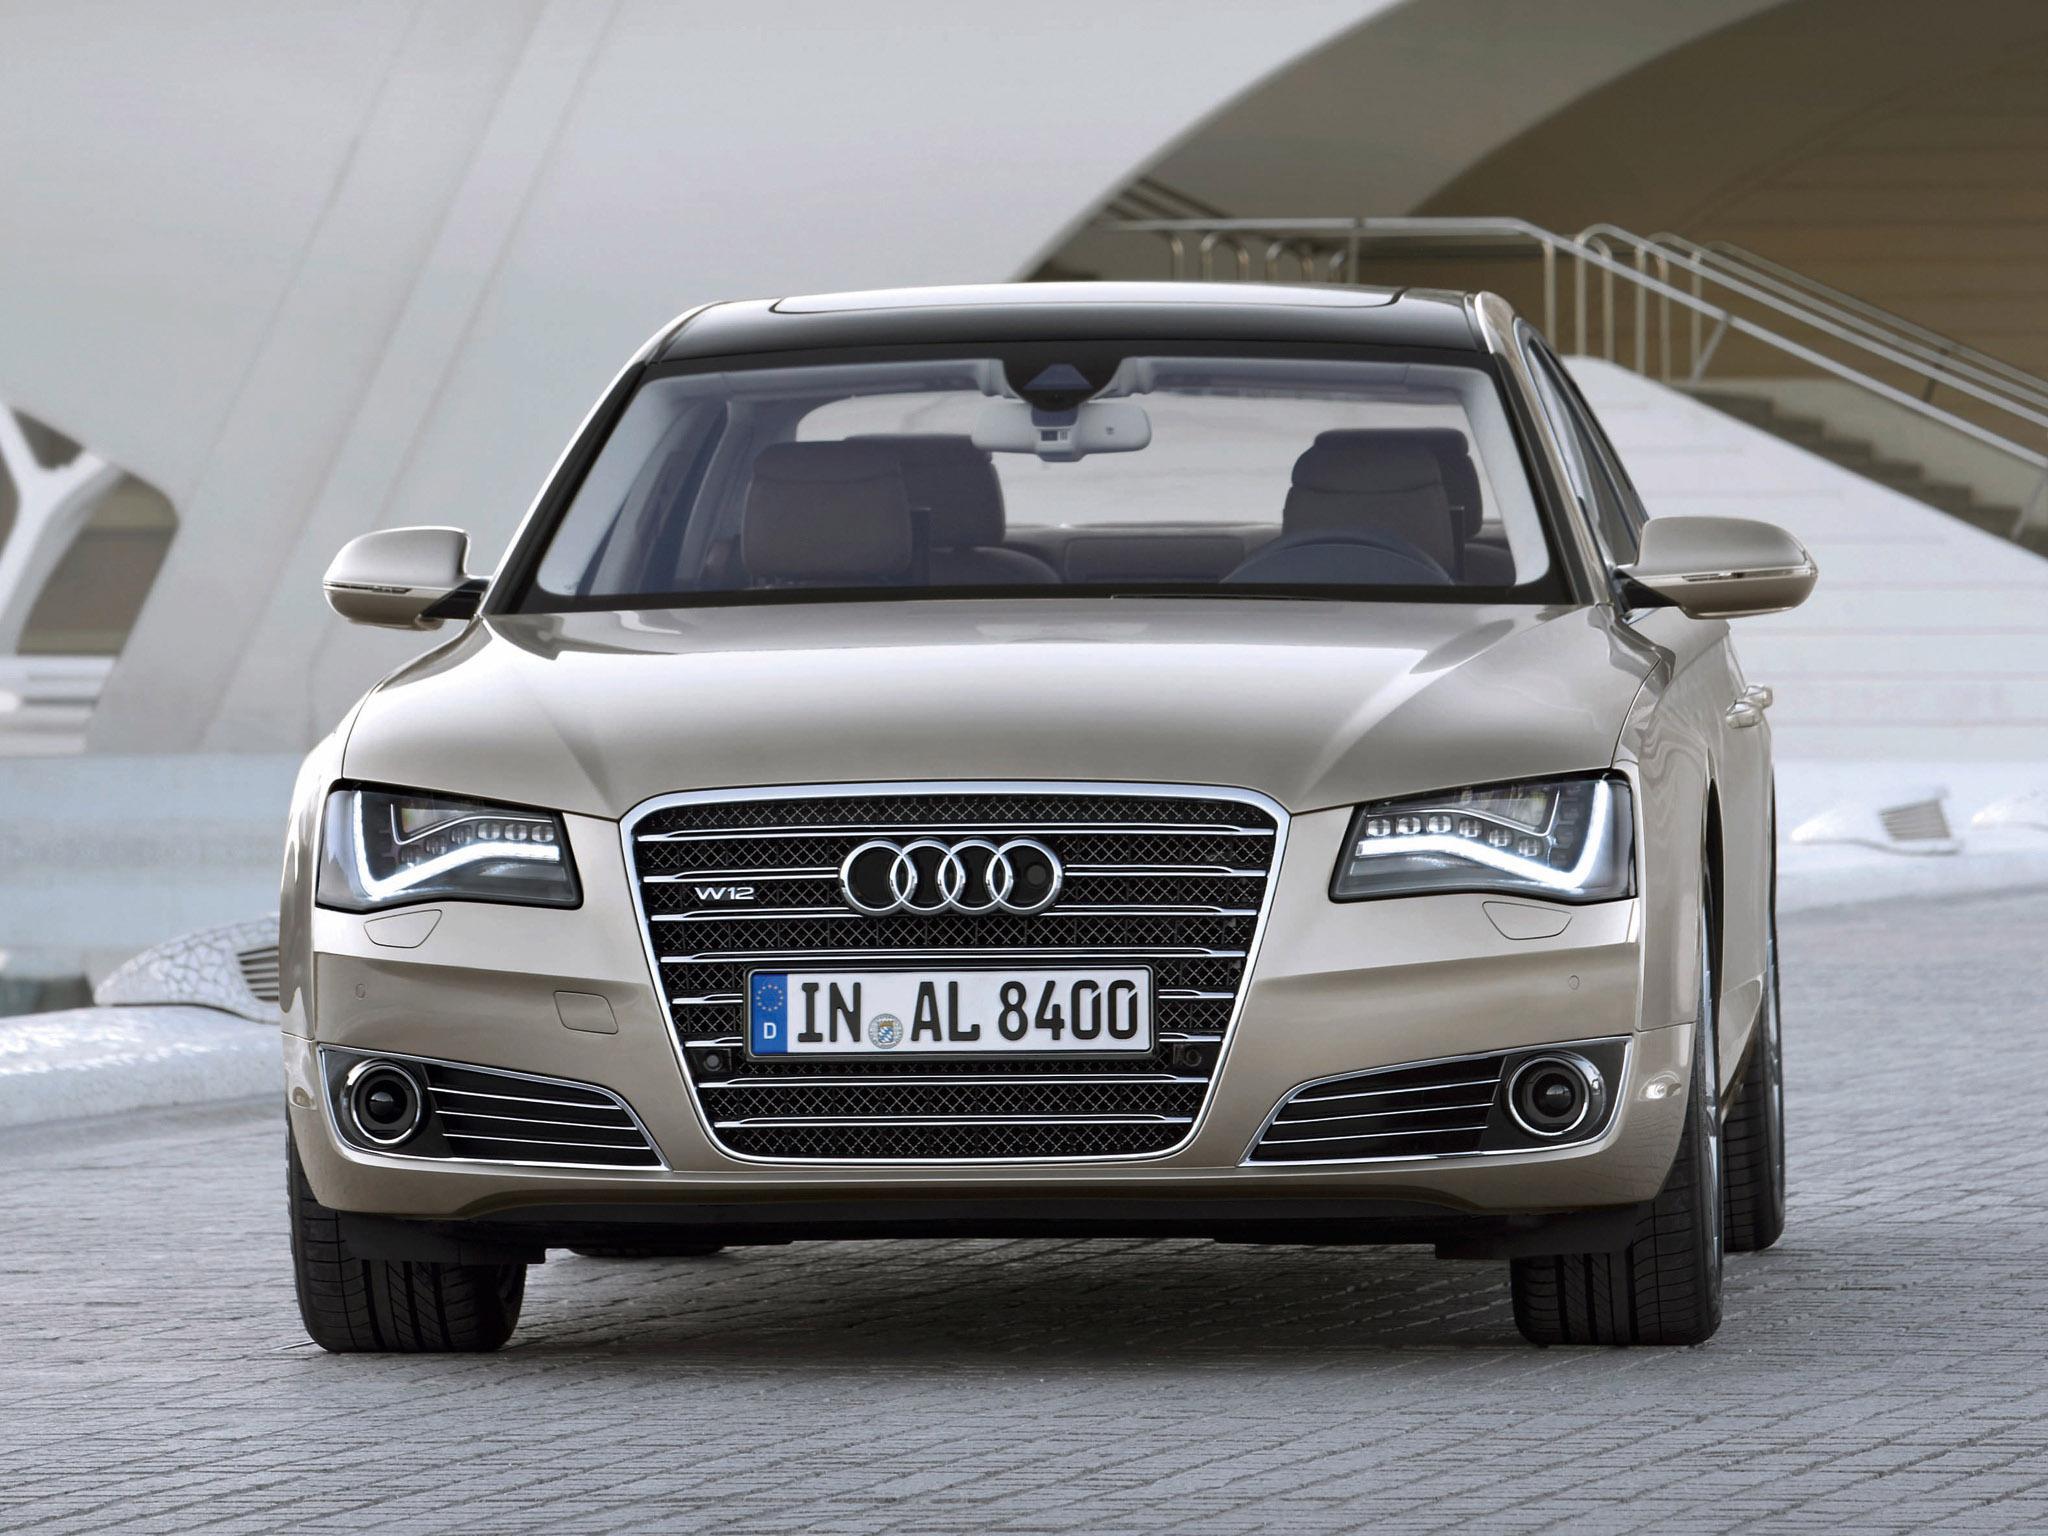 Audi A8 L W12 Quattro 2010 Audi A8 L W12 Quattro 2010 Photo 10 –  Audi A W on 2005 audi a8 w12, audi r8 w12, 2010 audi a8 l, 2004 audi a8 w12, 2007 audi a8 w12, 2010 audi a8l w12, 2008 audi a8 w12,